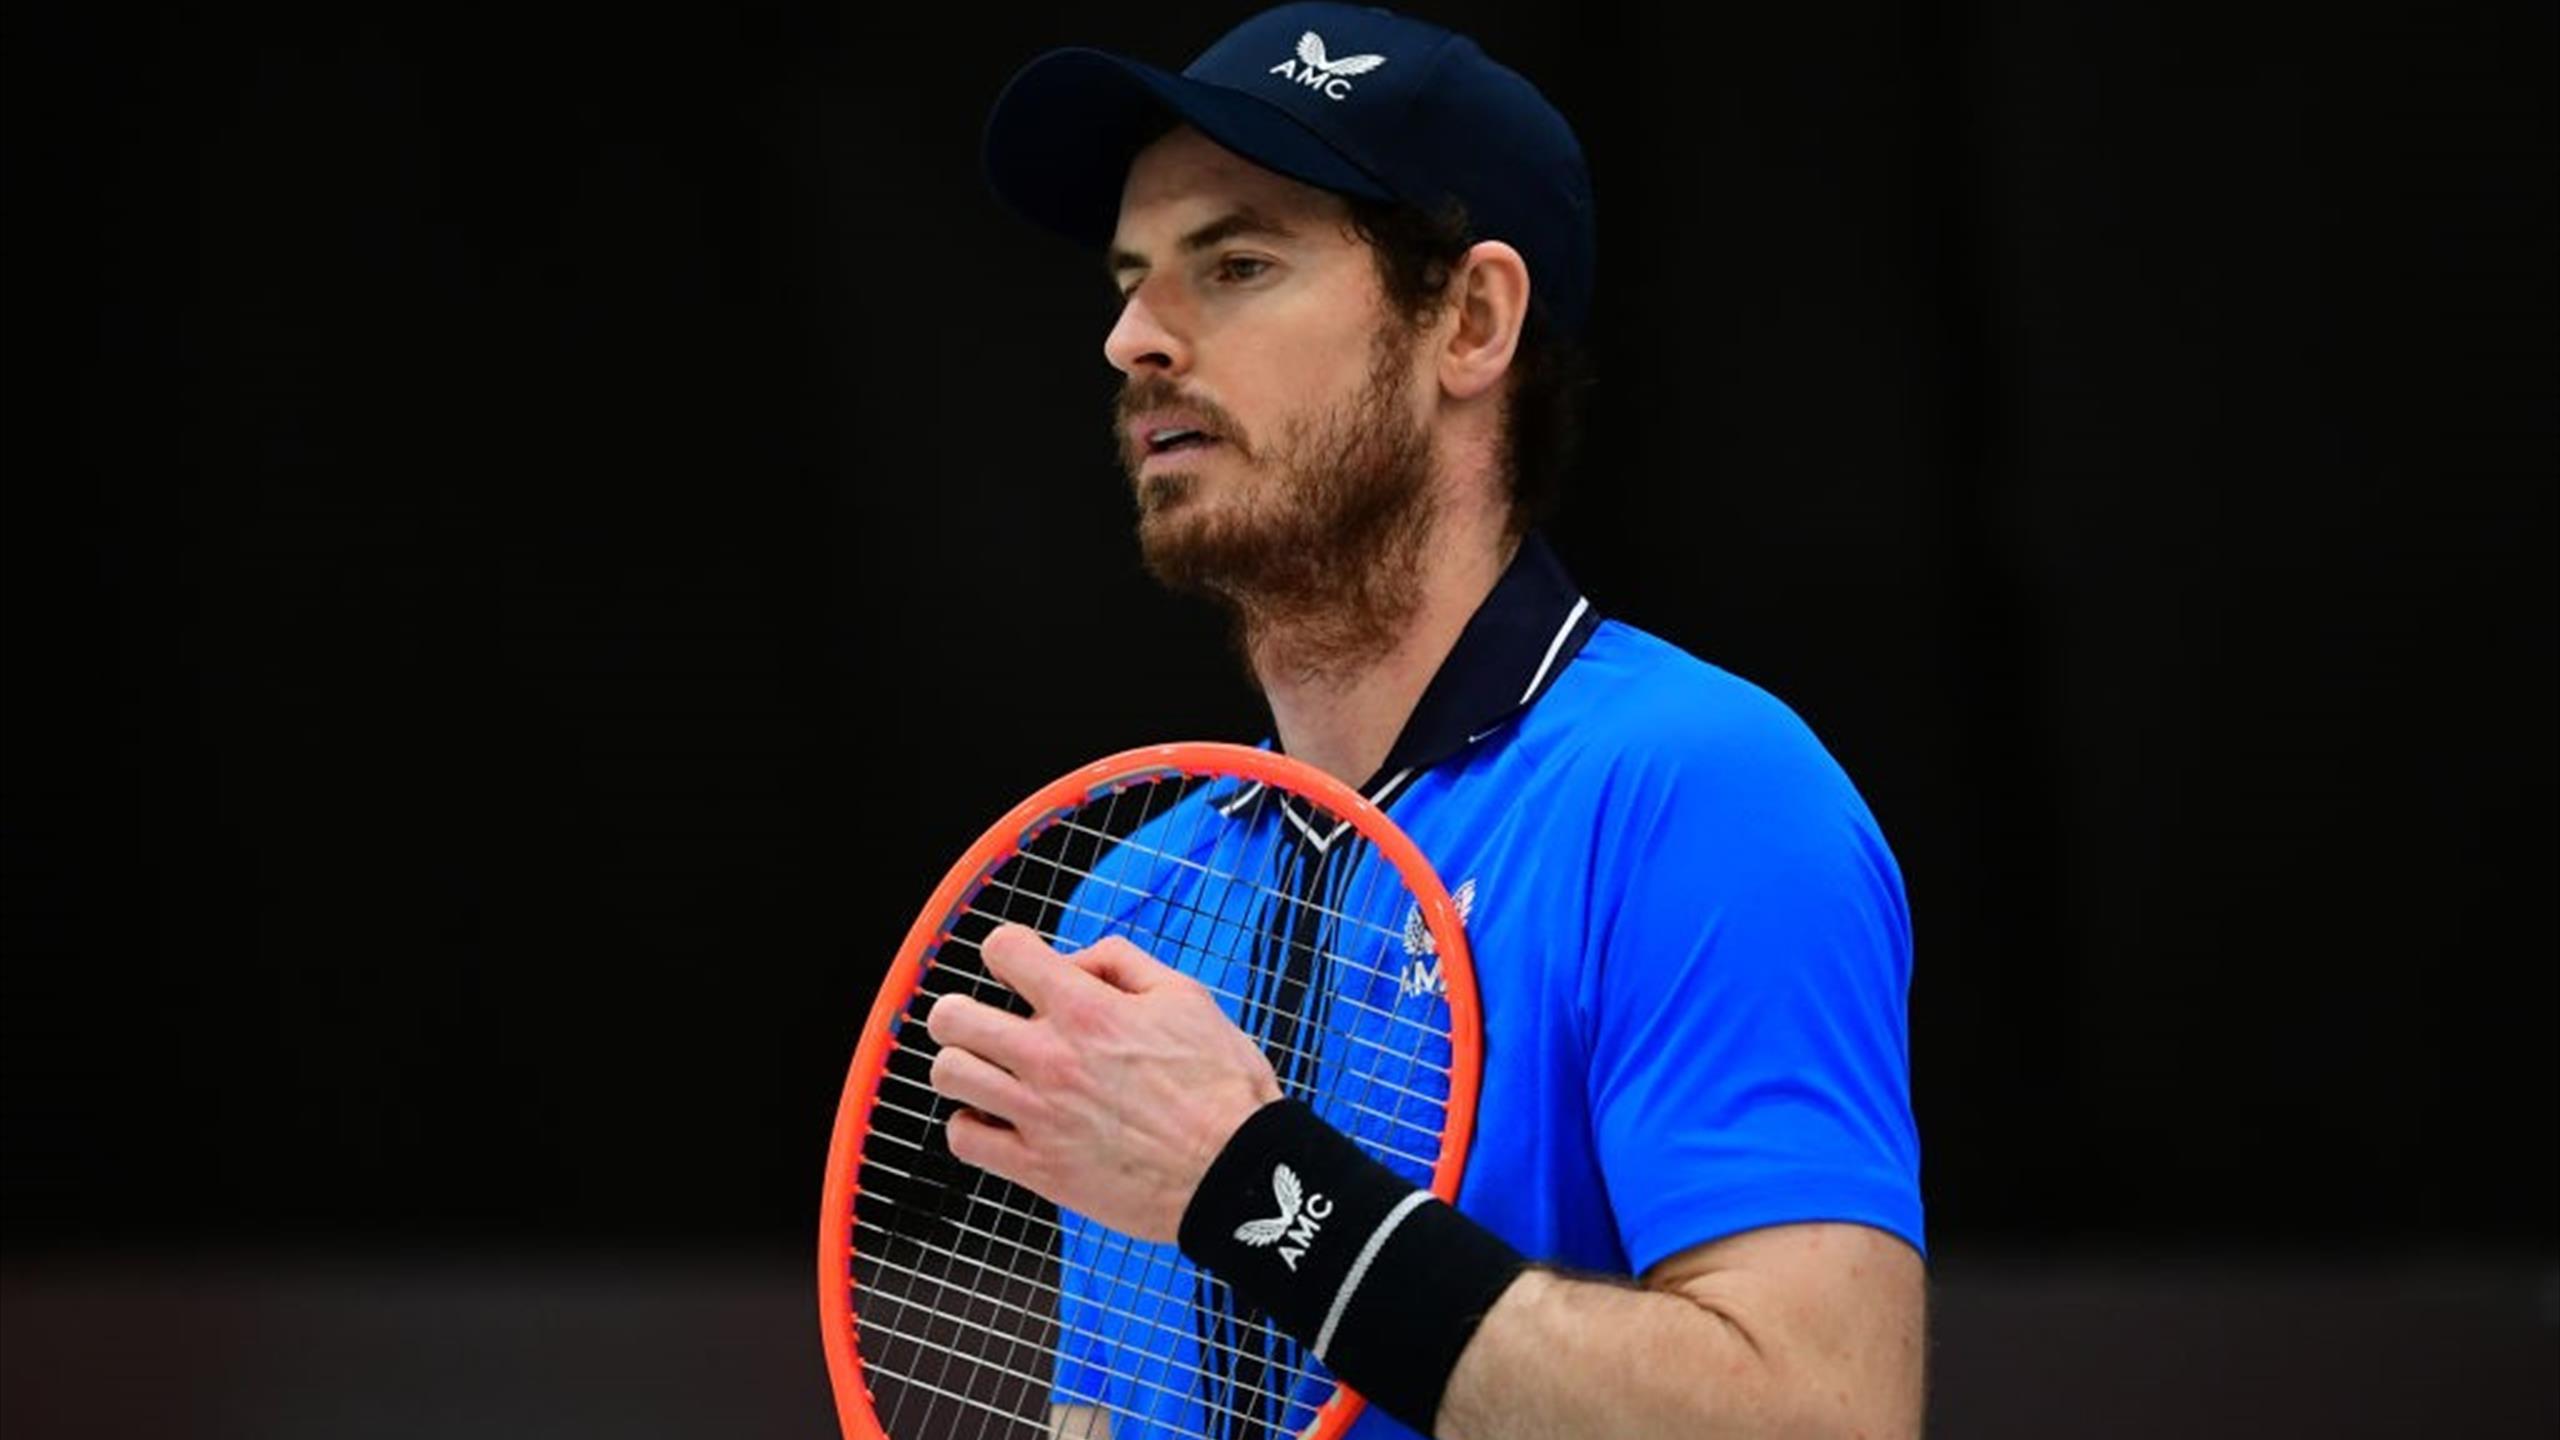 ATP Montpellier : Andy Murray sorti dès le 1er tour par Egor Gerasimov - Eurosport FR